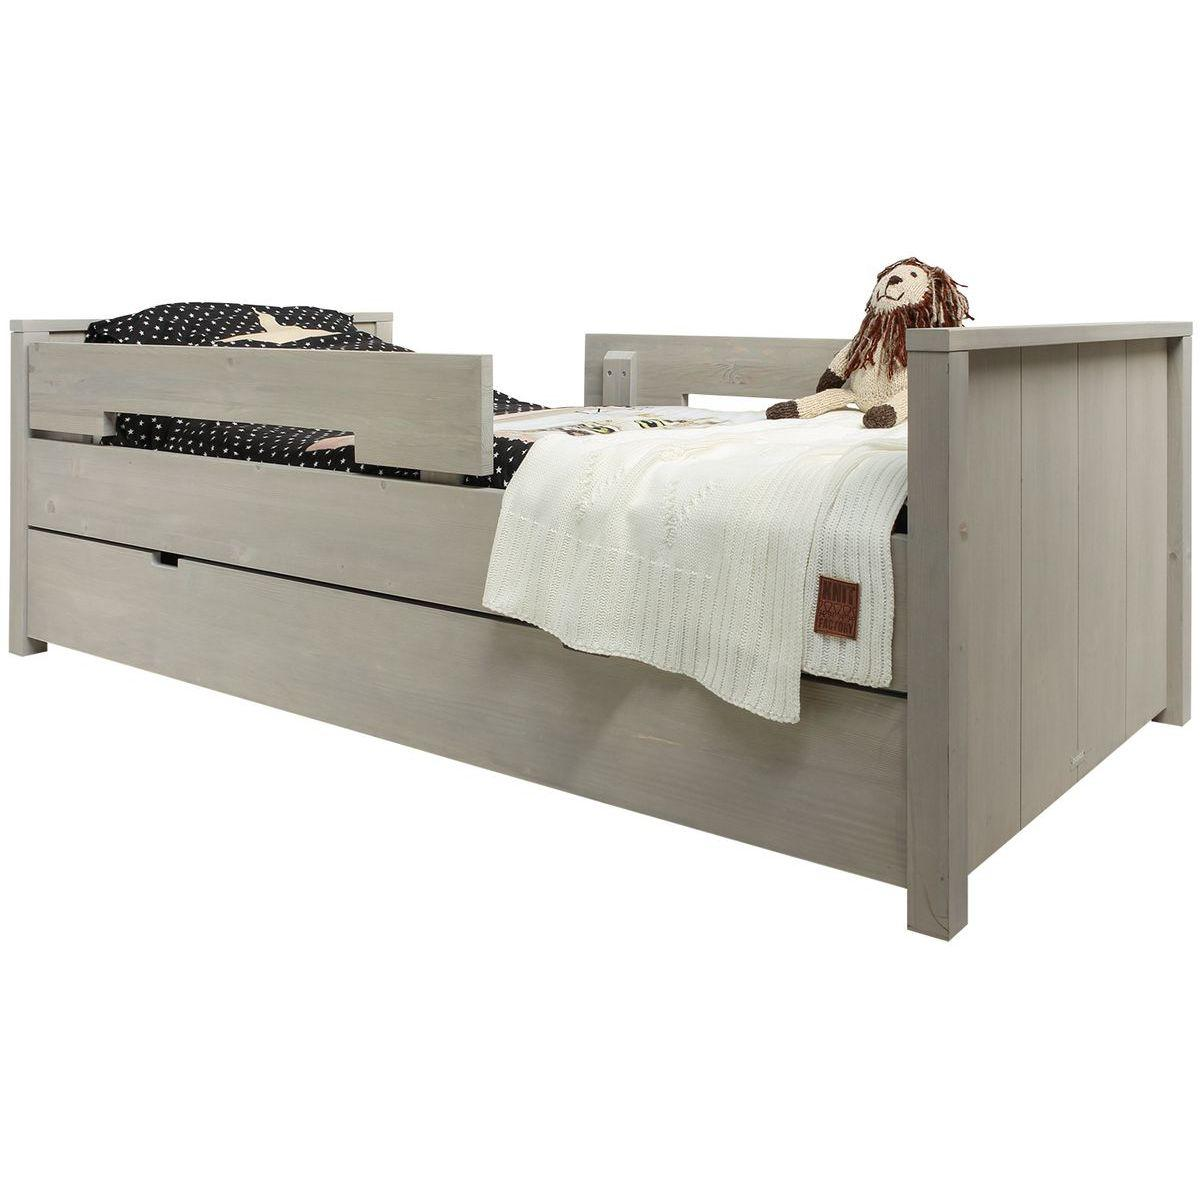 Lit 90x200cm BASIC WOOD Bopita gravel wash